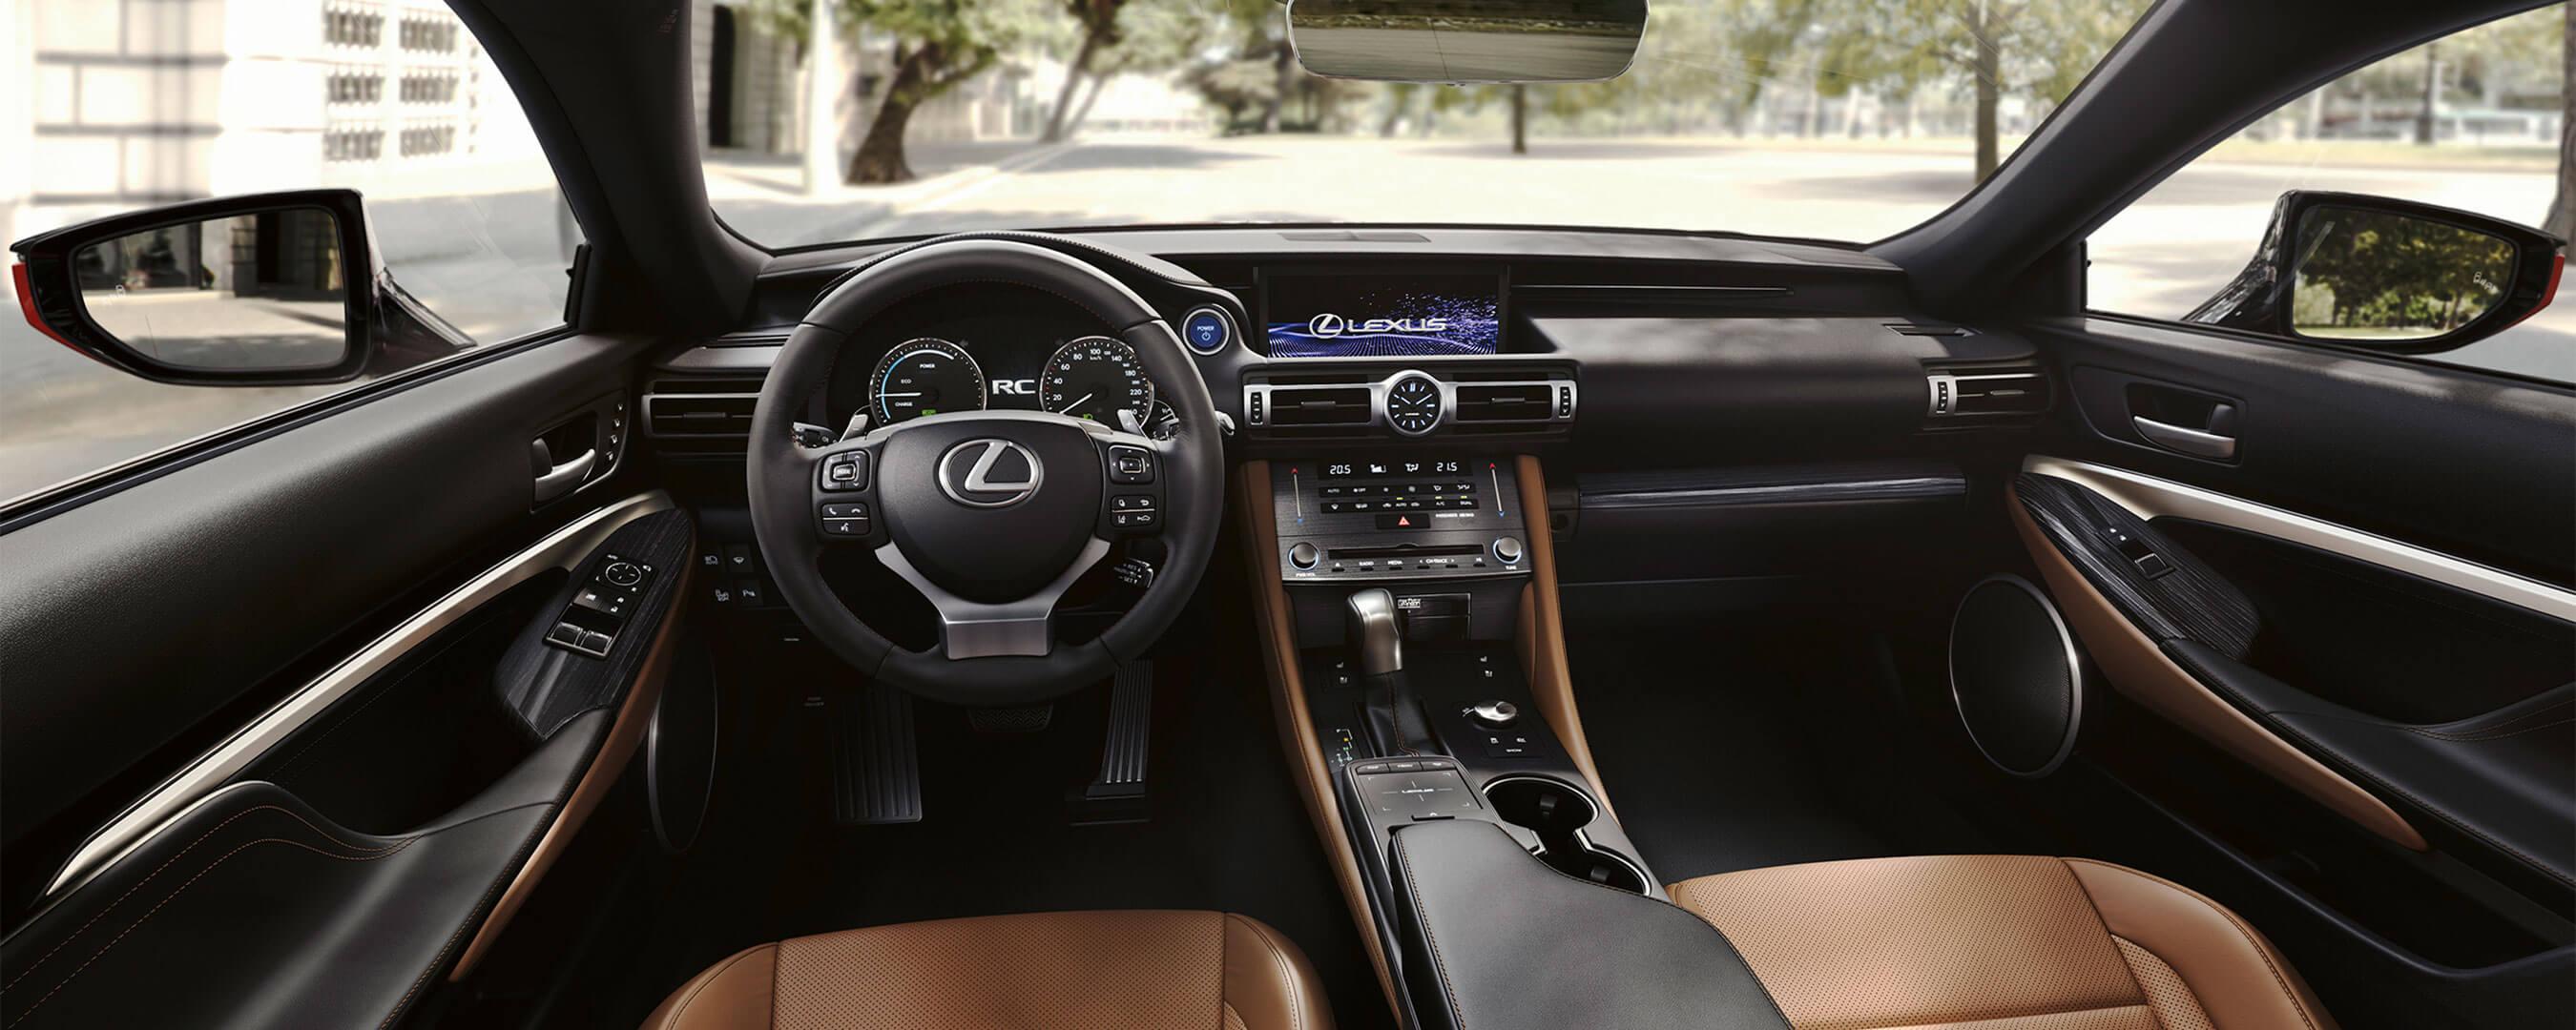 2018 lexus rc experience interior front